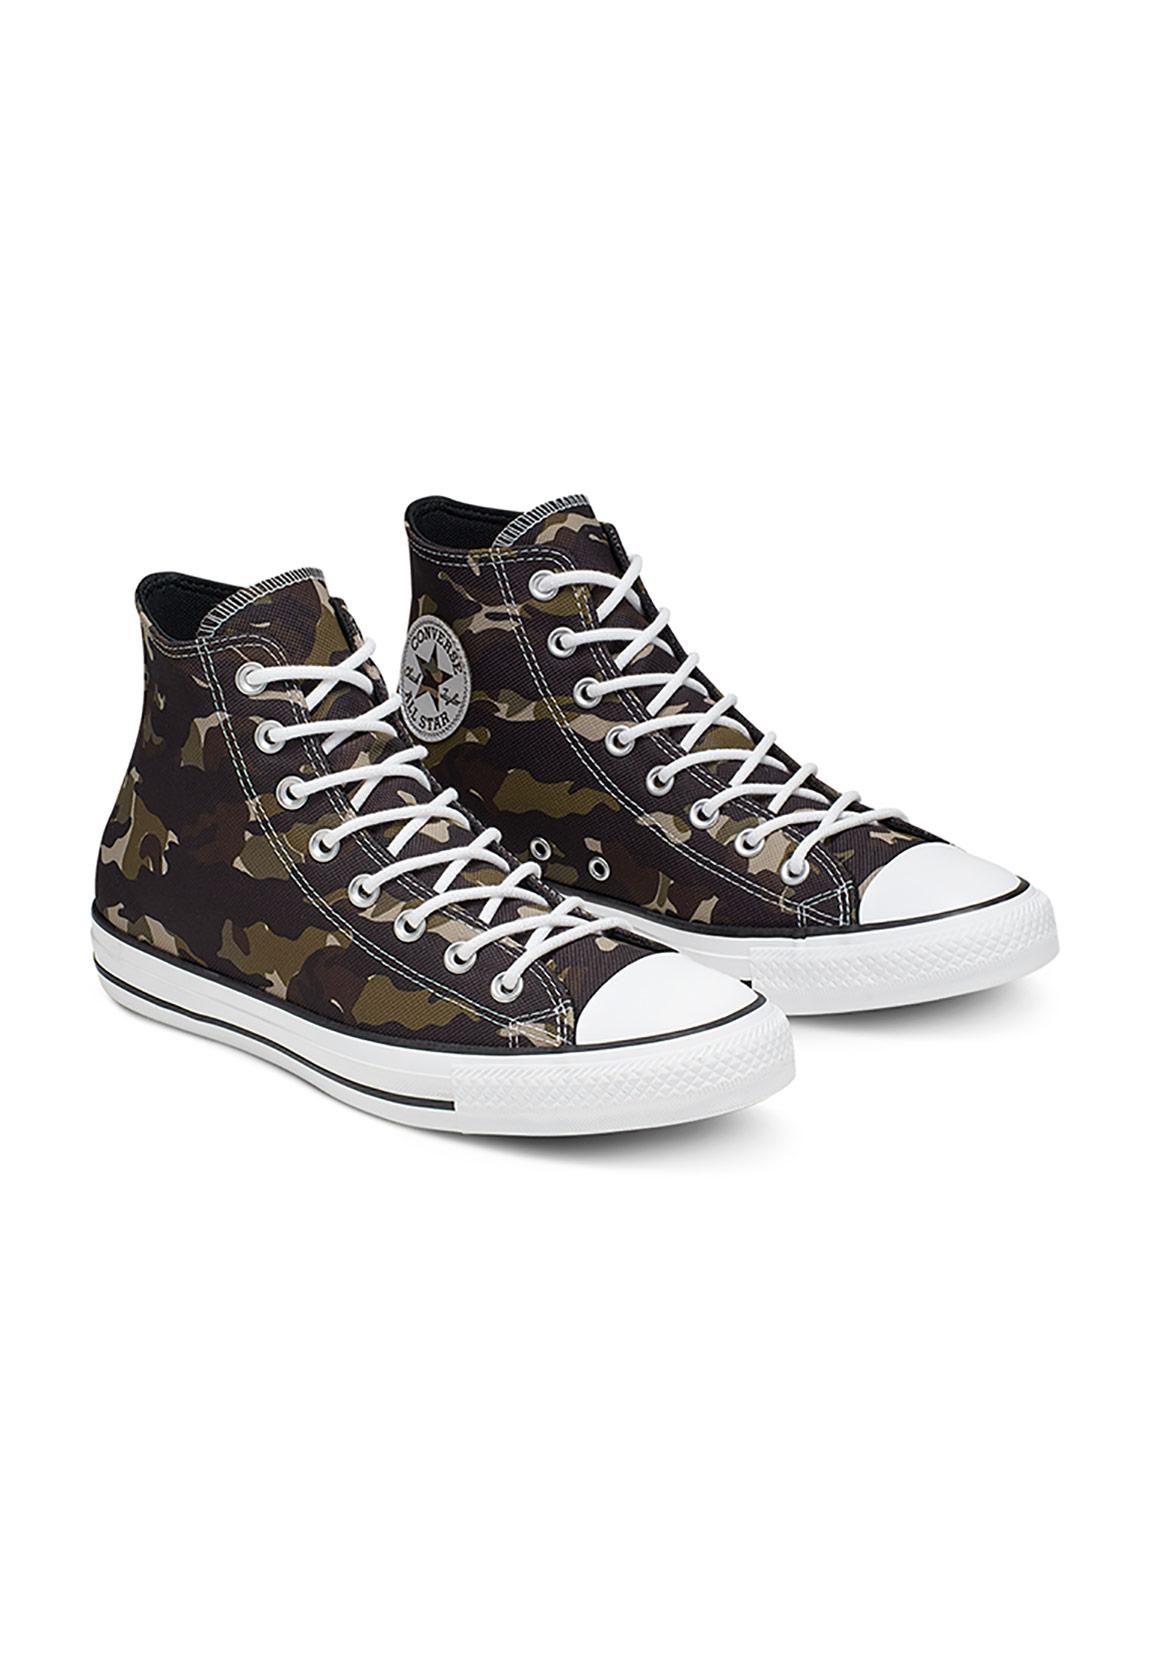 Details zu Converse Chucks CTAS HI 165915C Camouflage